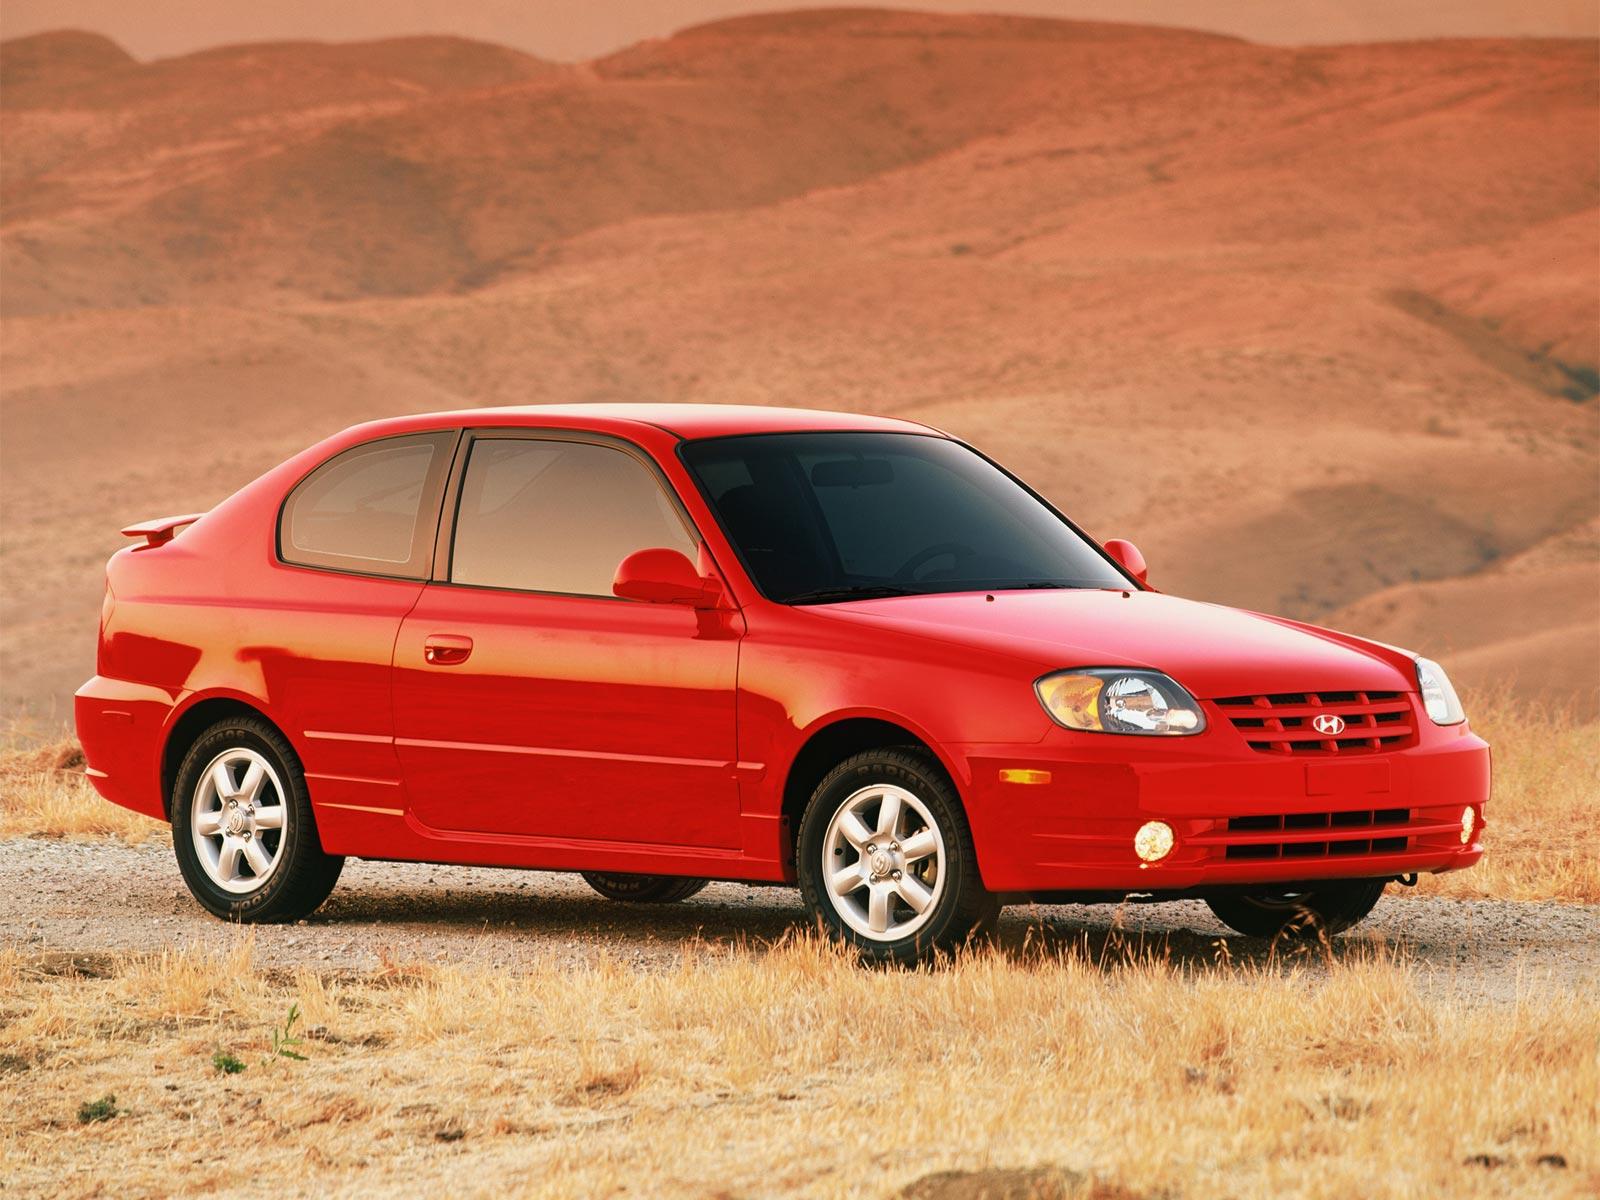 2005 Hyundai Accent Hatchback (c) Hyundai